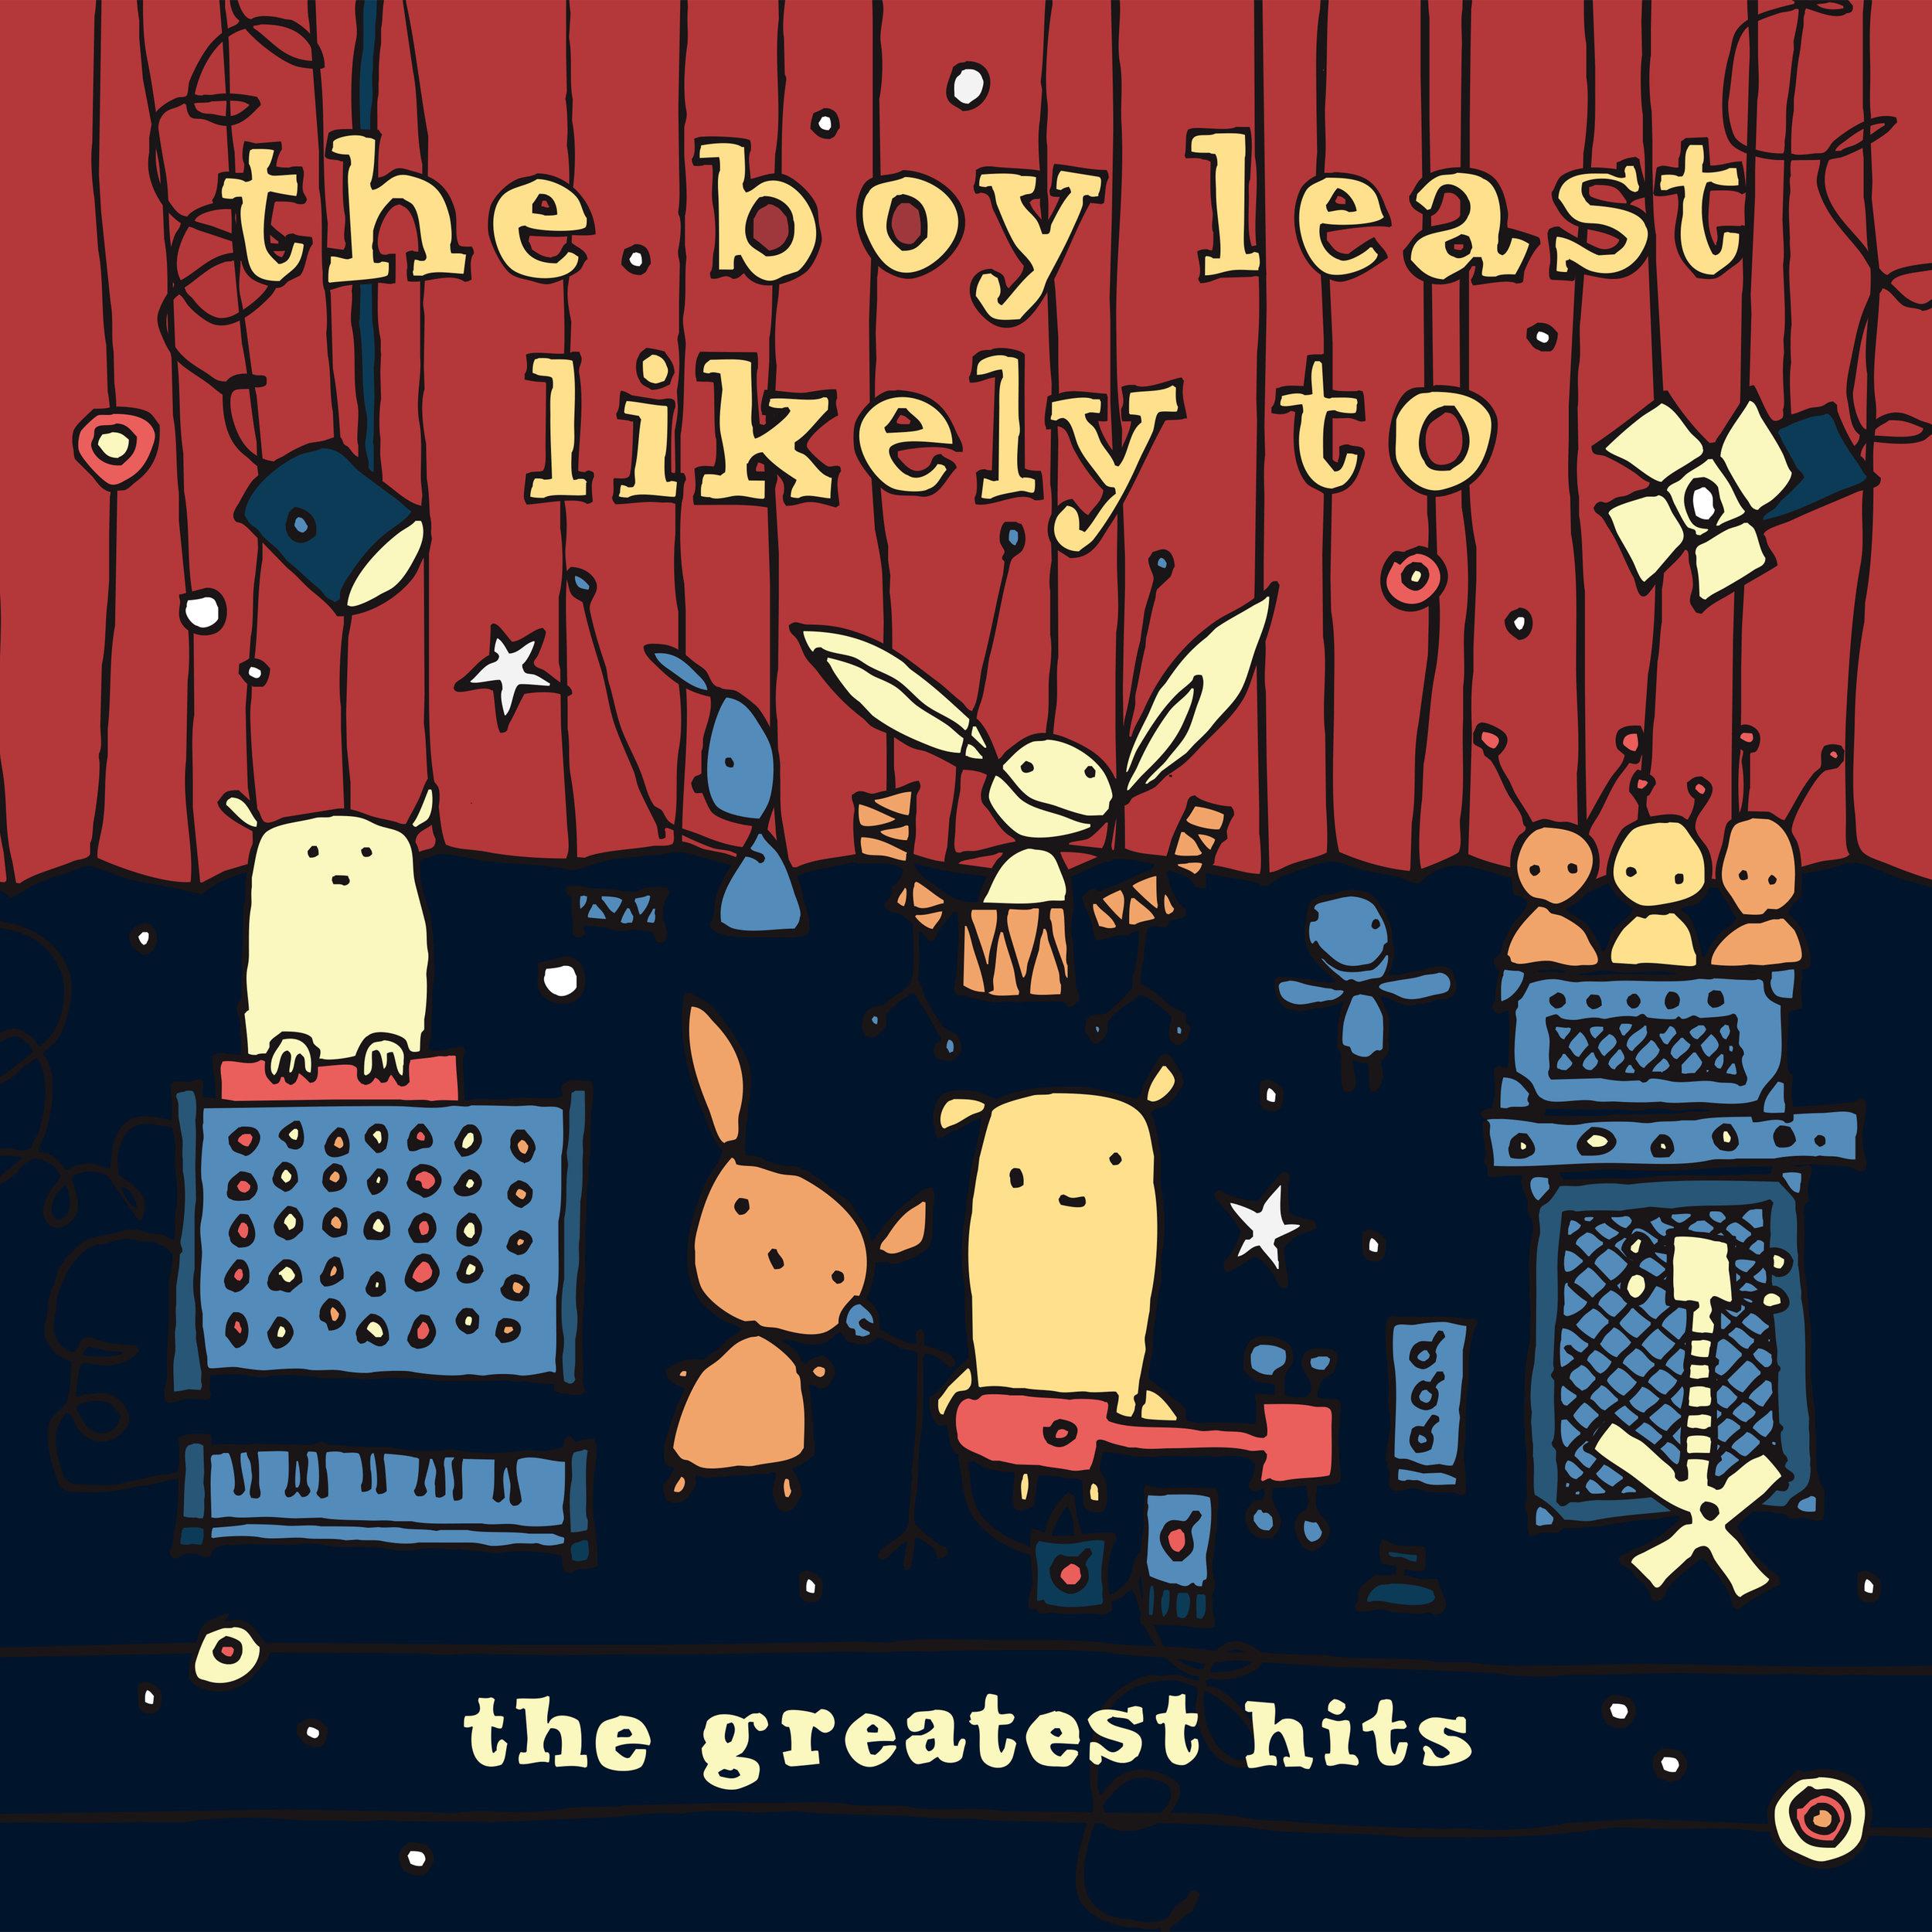 TBLLT_Greatest Hits 4000px x 4000px.jpg